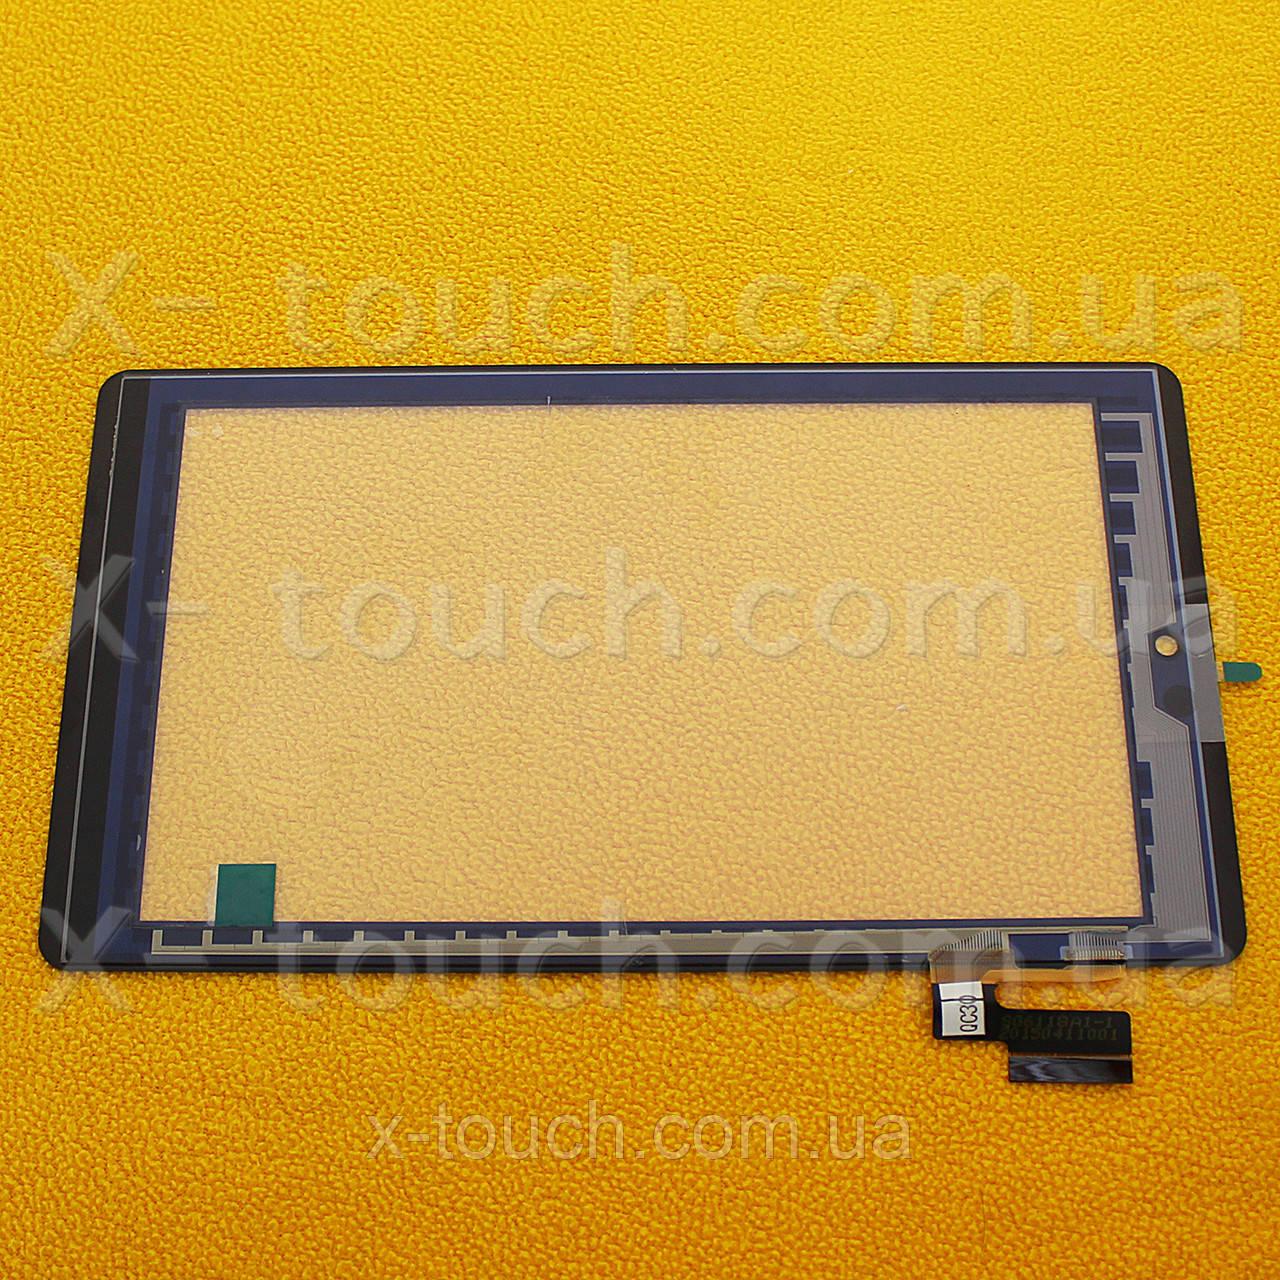 Тачскрин, сенсор  X-Pad Sky 7  для планшета